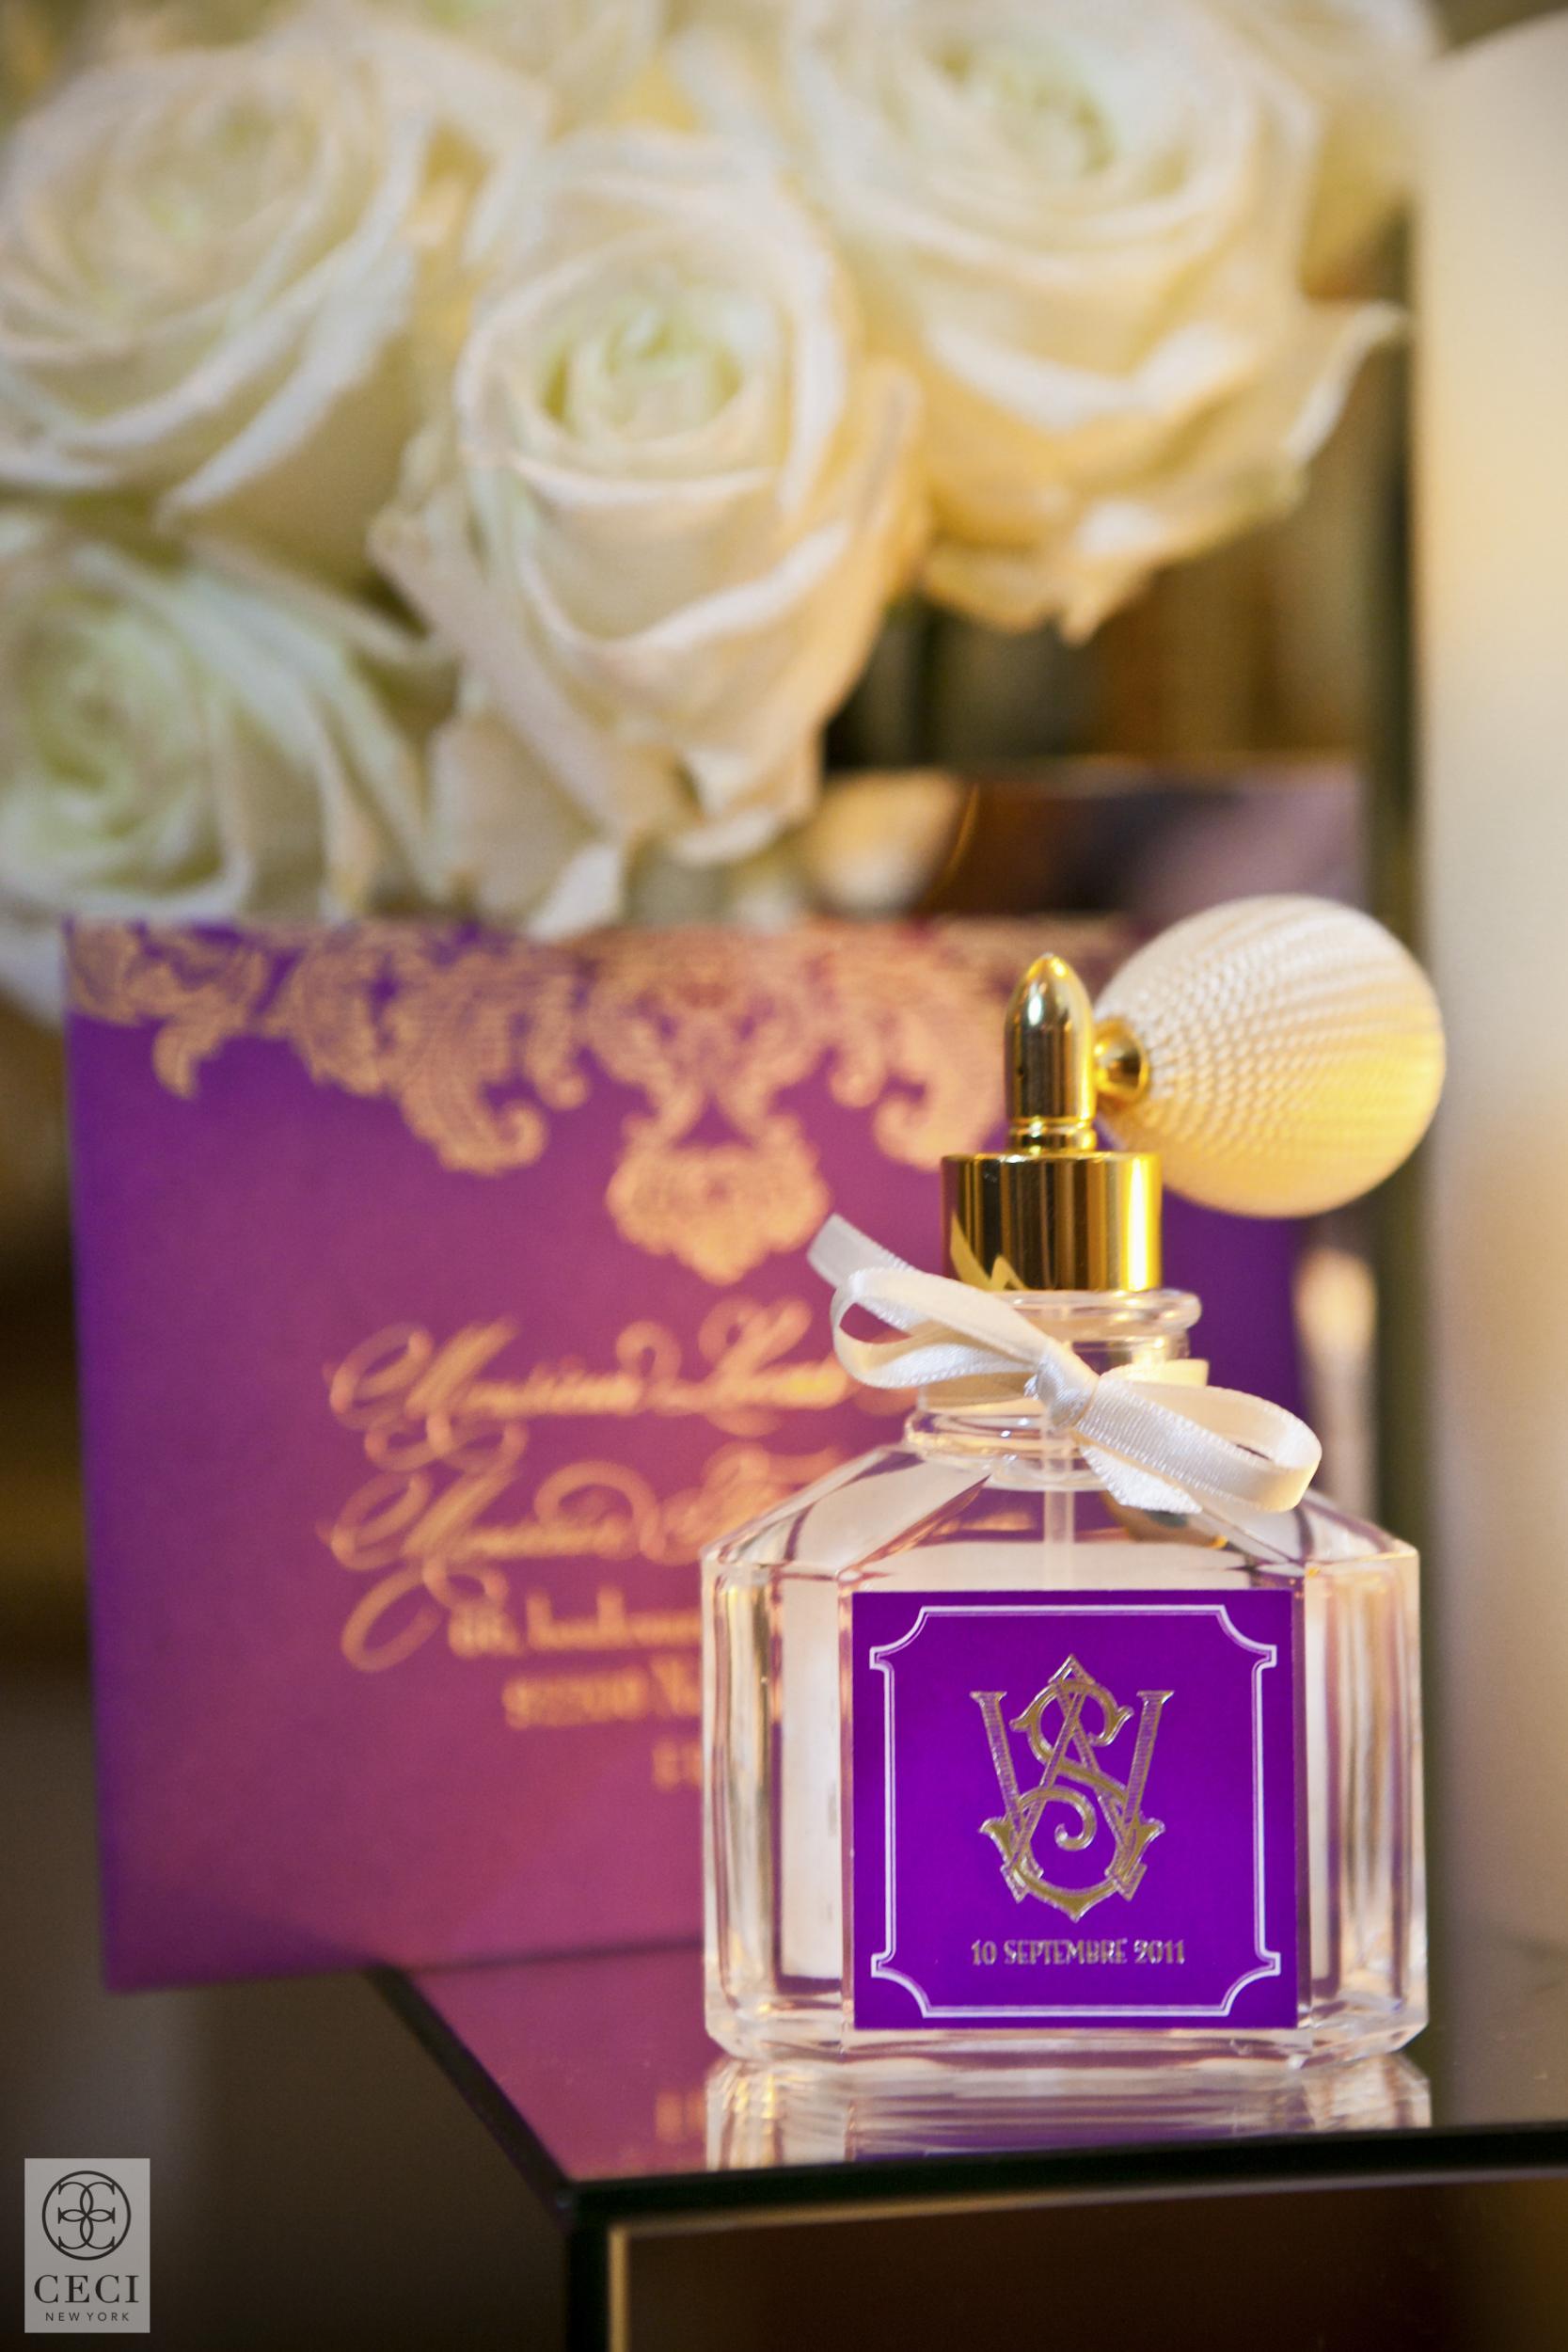 ceci_new_york_lucas_somoza_purple_regal_wediding_birthday_commitment_ceremony_invitation_logo_branding_perfume_gold_-9.jpg